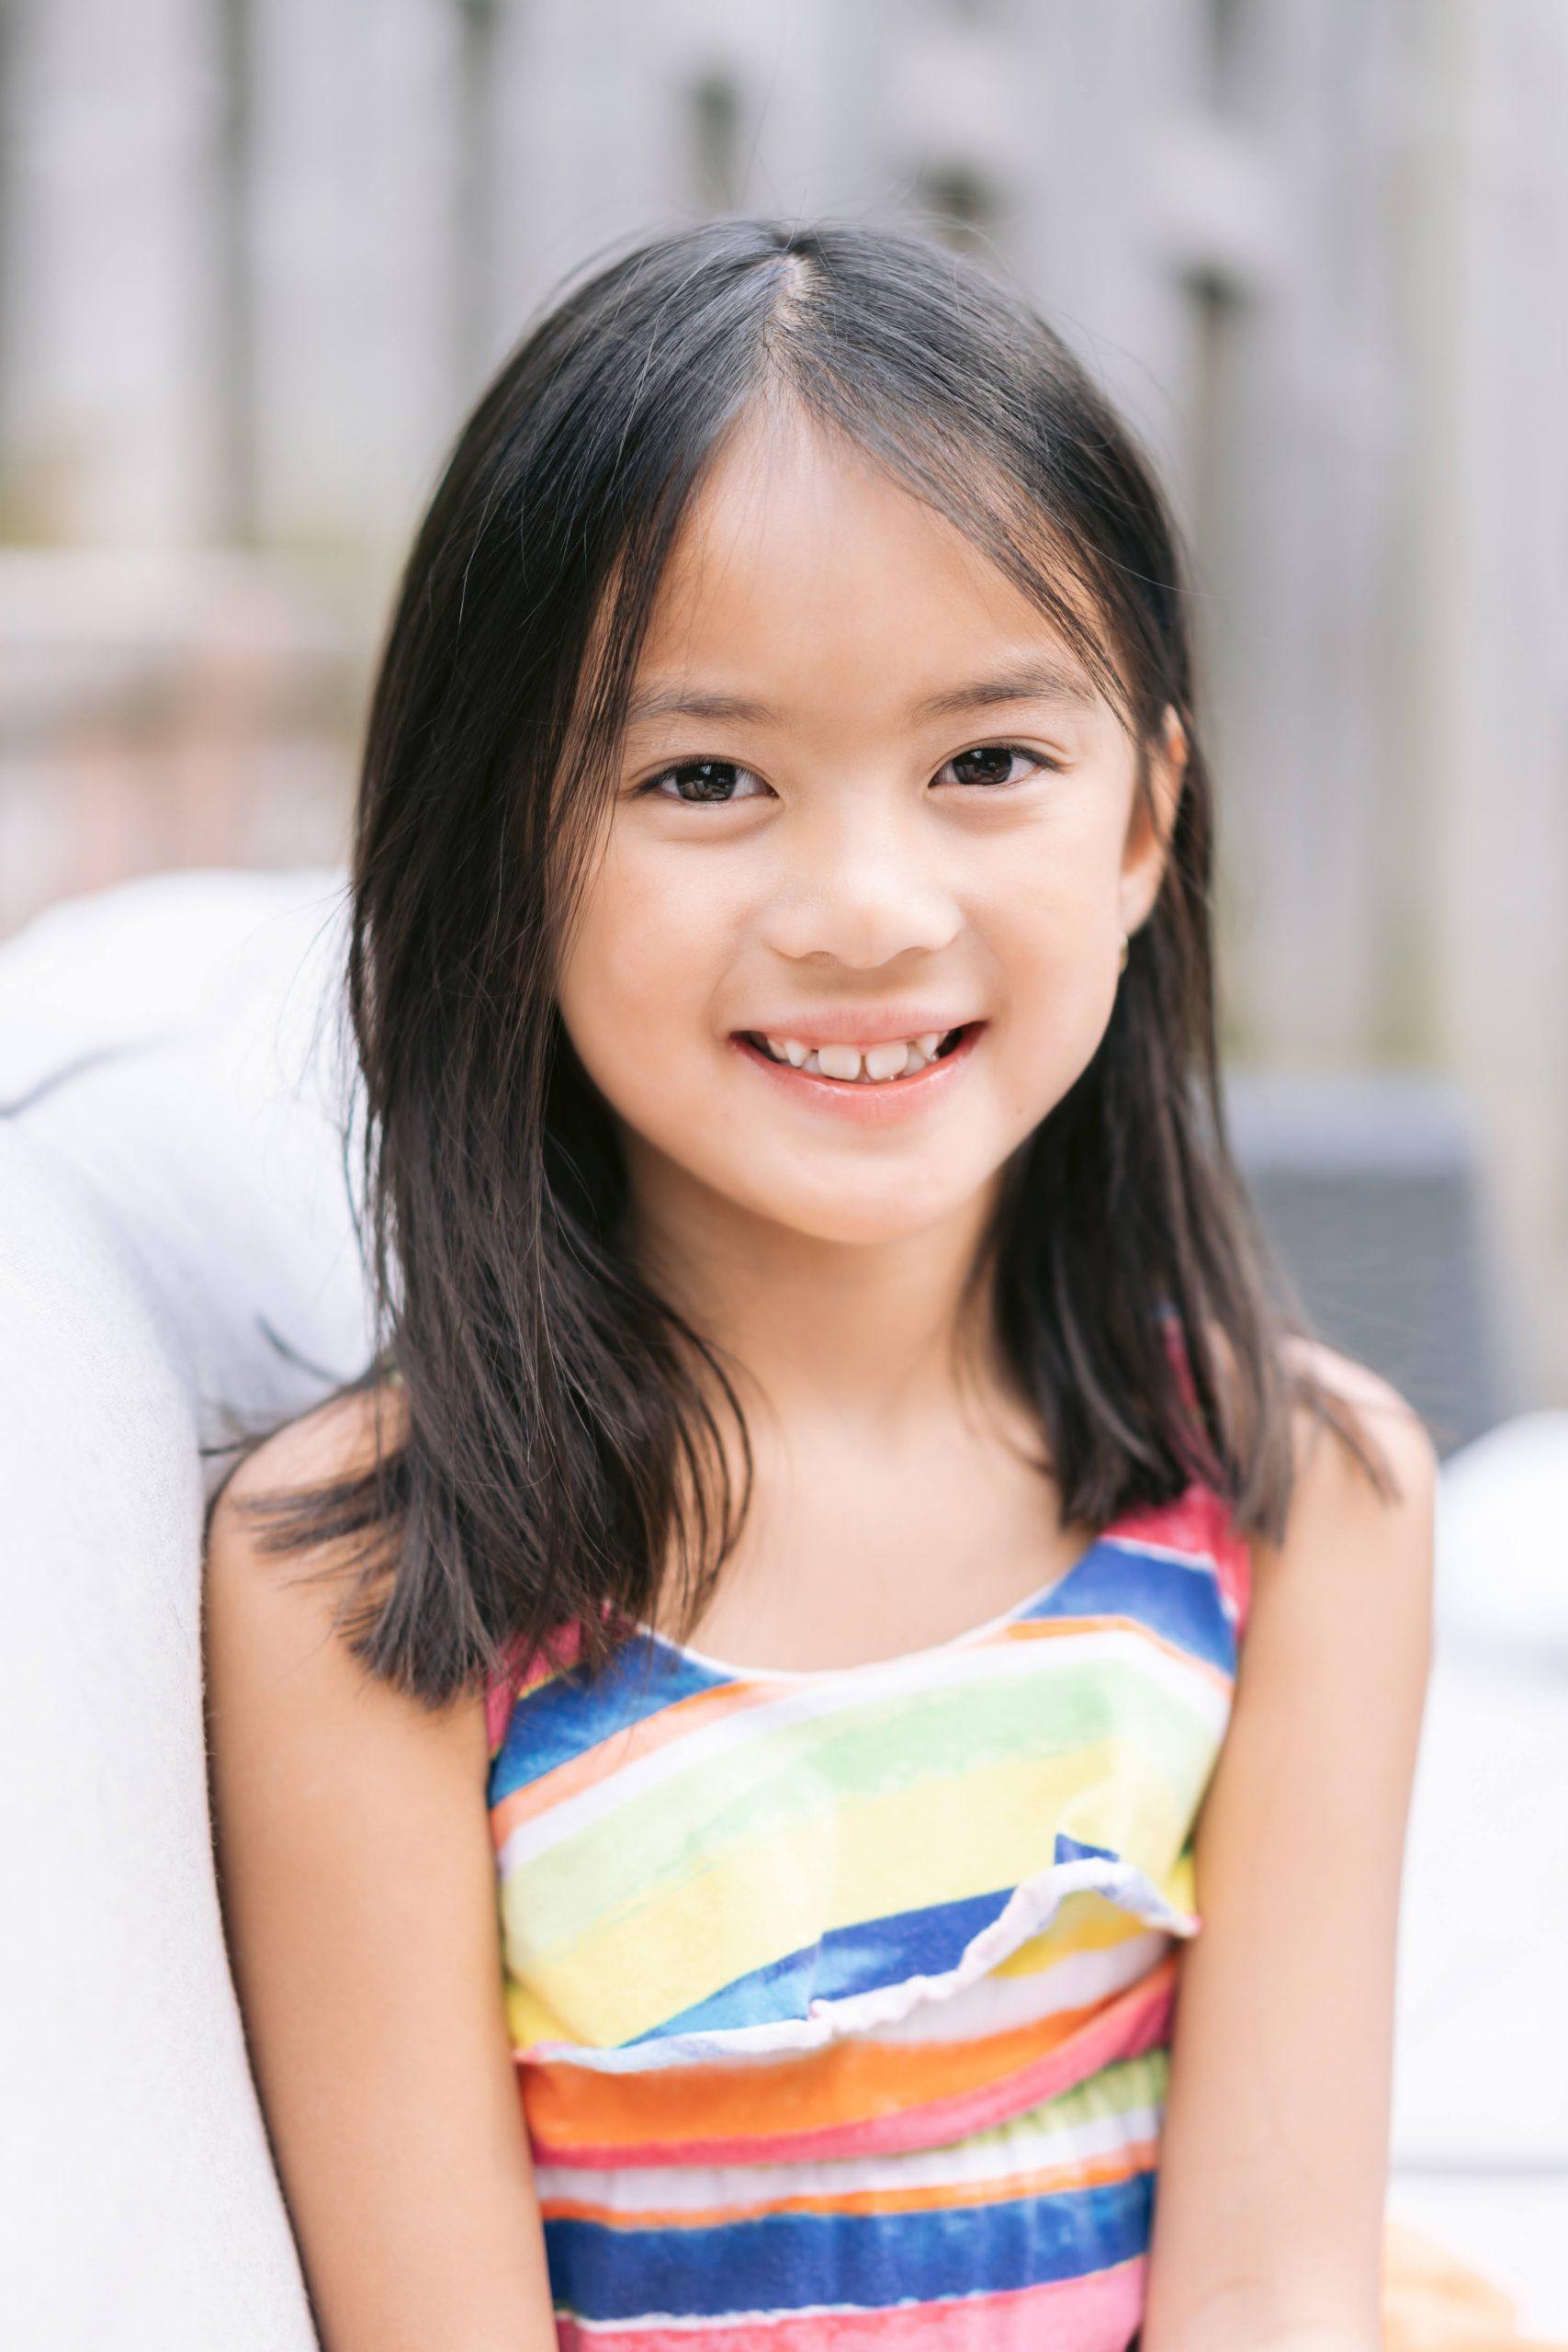 A photo Joee Wong's daughter.